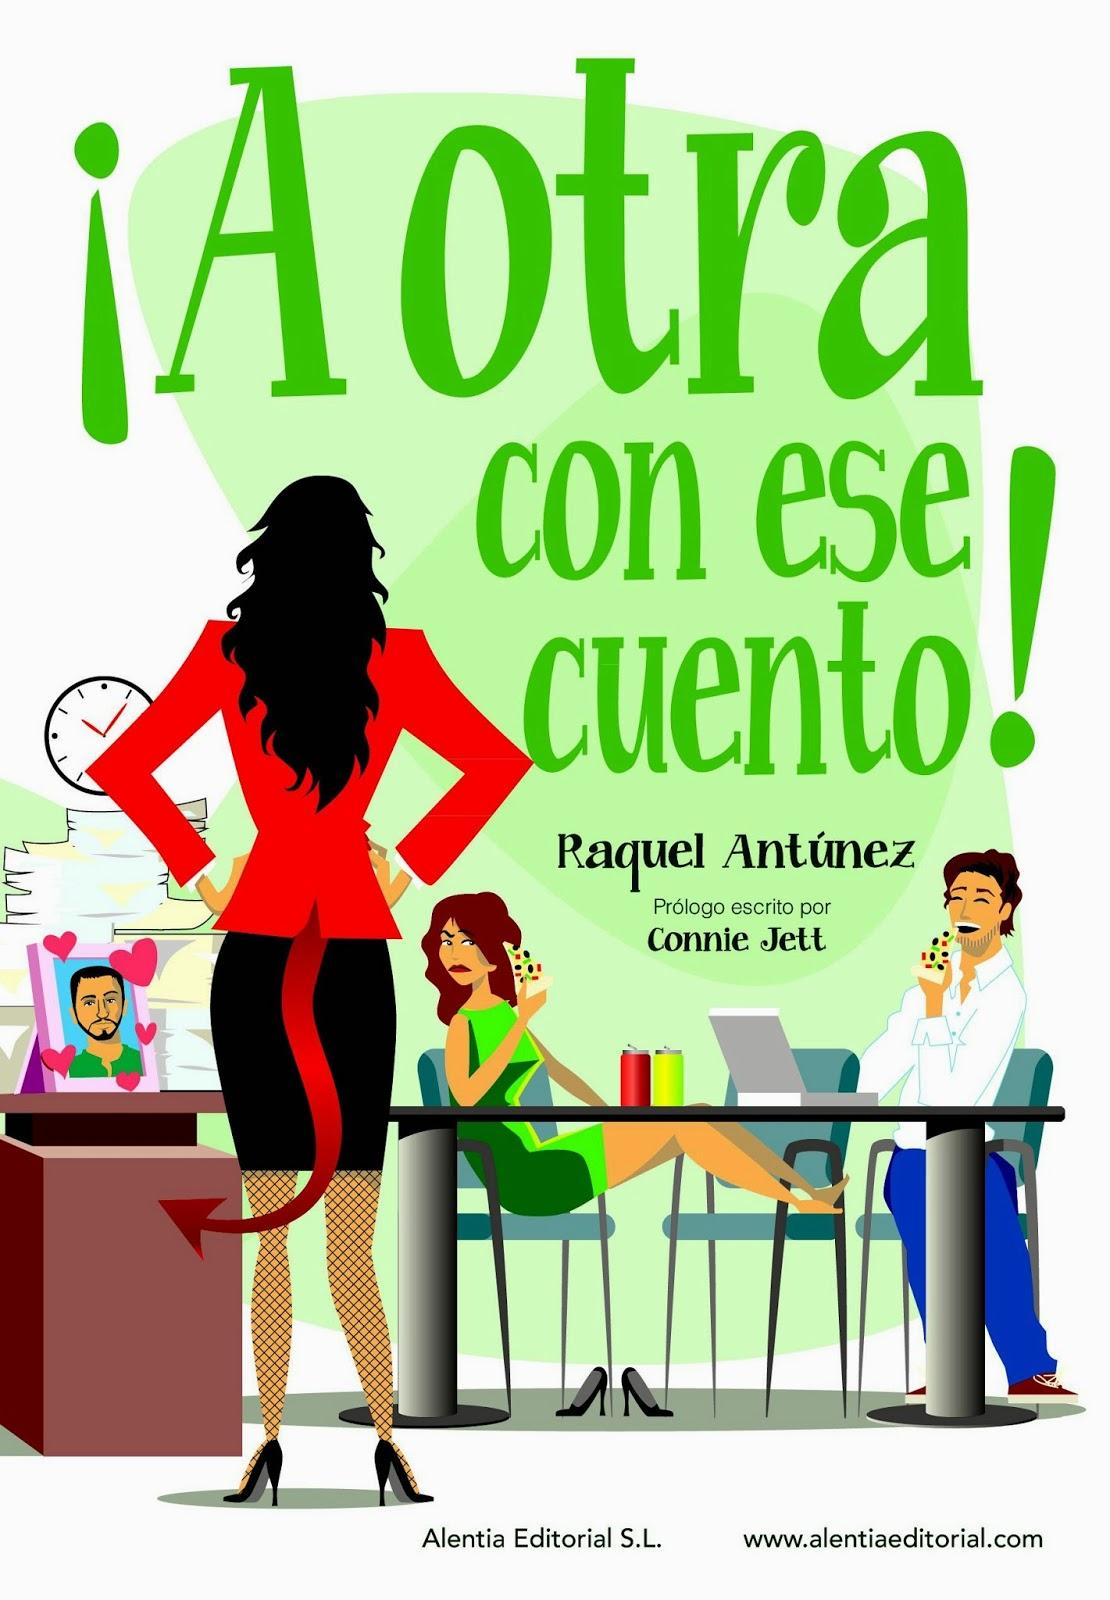 http://alentiaeditorial.com/bookstore/?product=a-otra-con-ese-cuento-raquel-antunez